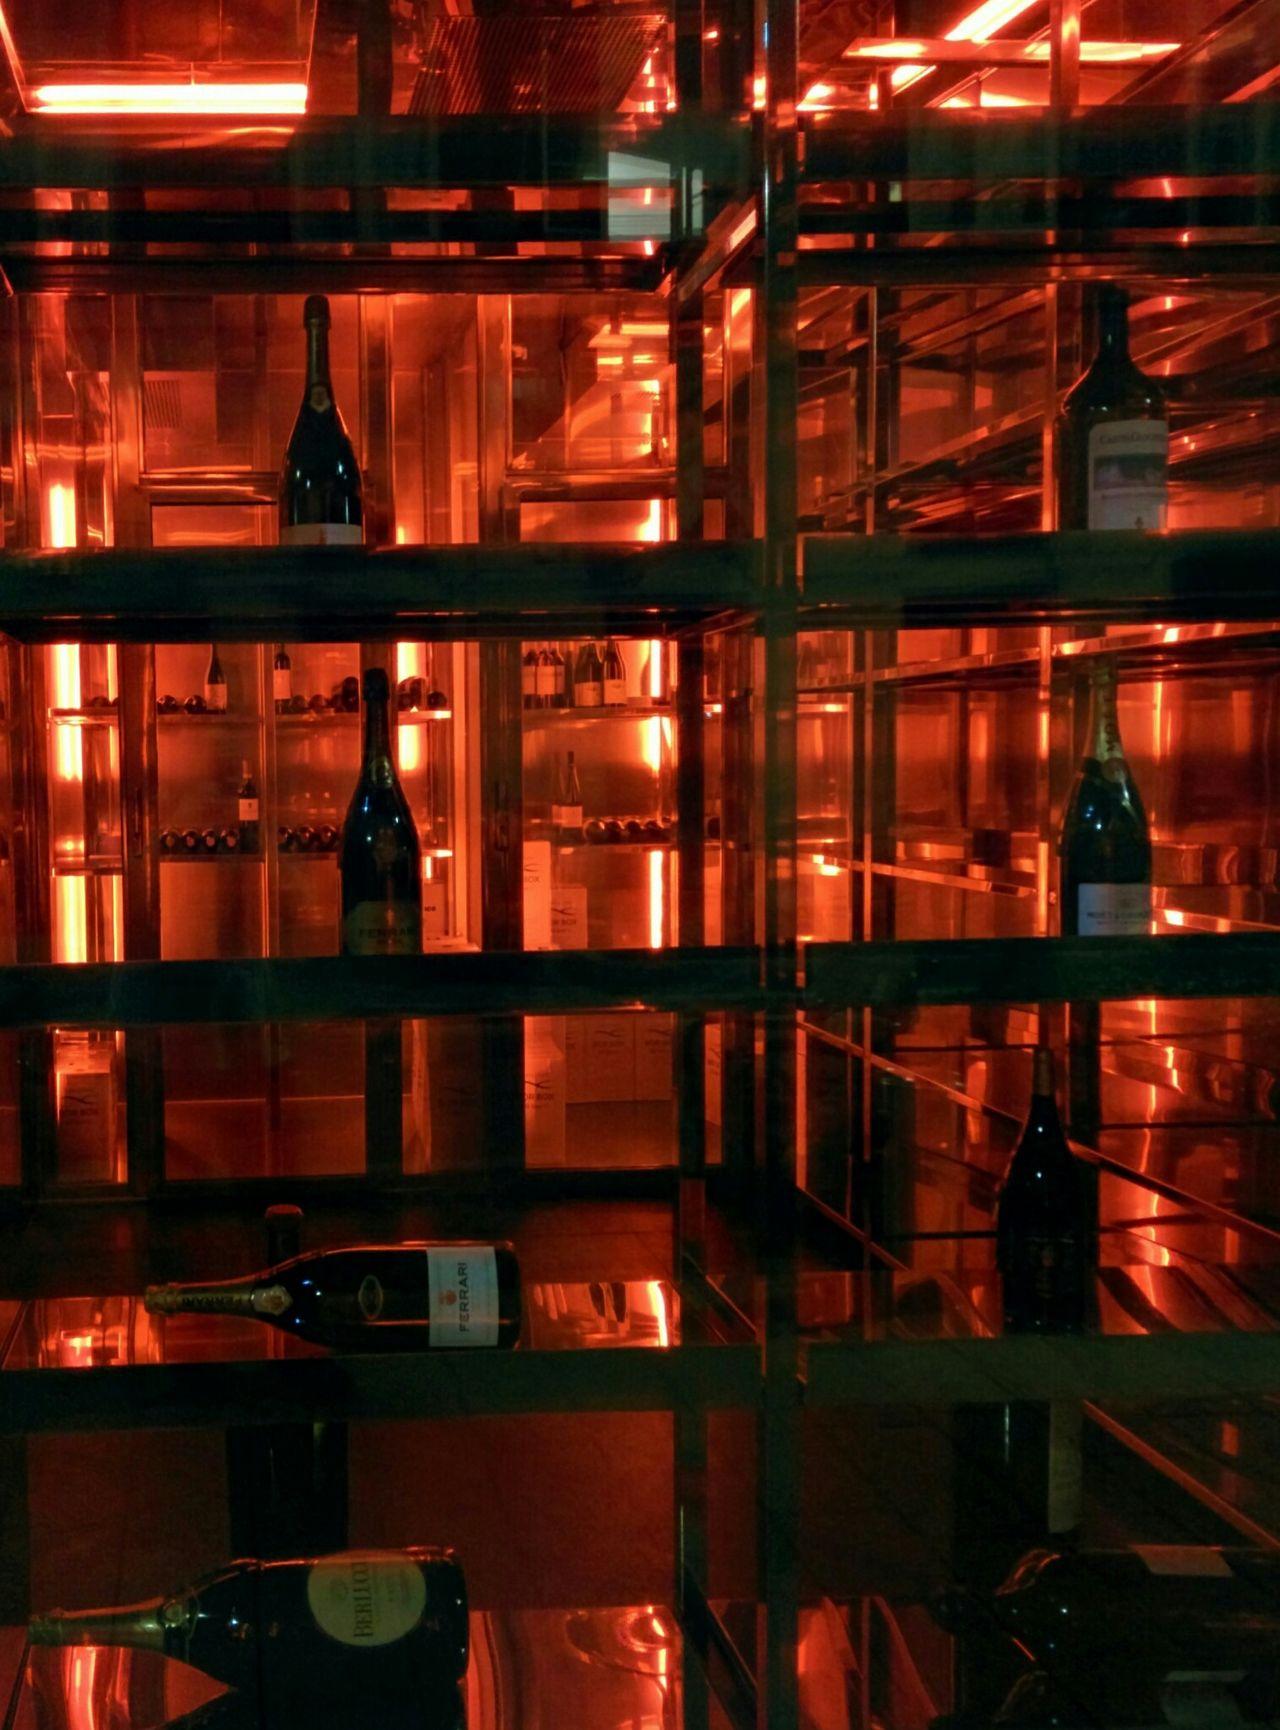 Fridge Champagne Berlucchi Ferrari Spumante Cold Room Merchandising Exposition